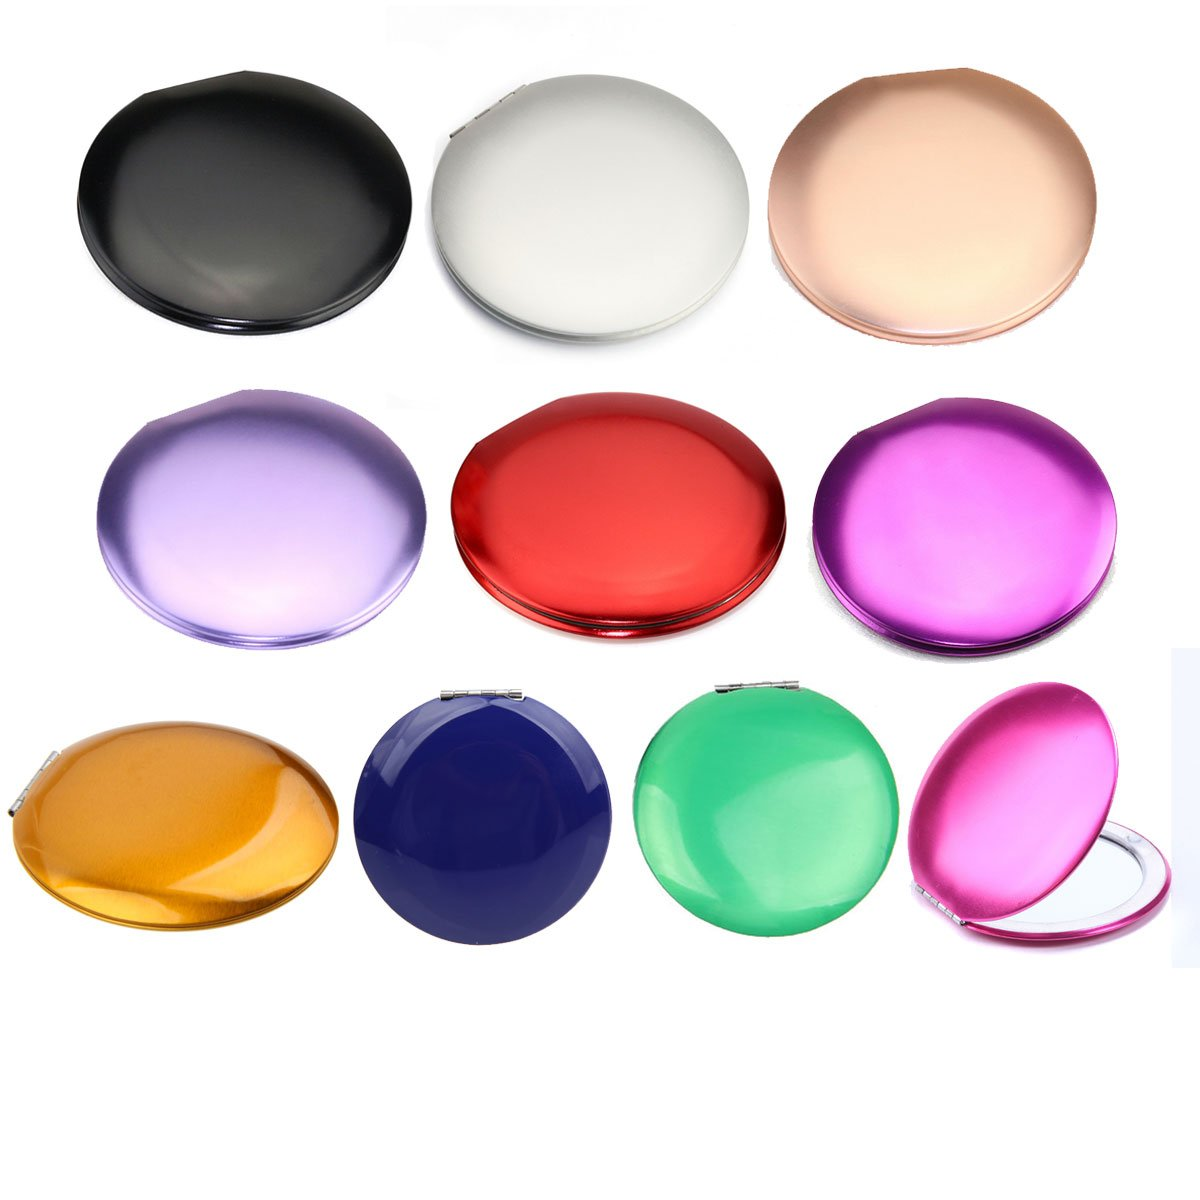 10pcs Different Colors Double Compact Cosmetic Makeup Round Pocket Purse Magnification Jewel Mirror 10pcs-A